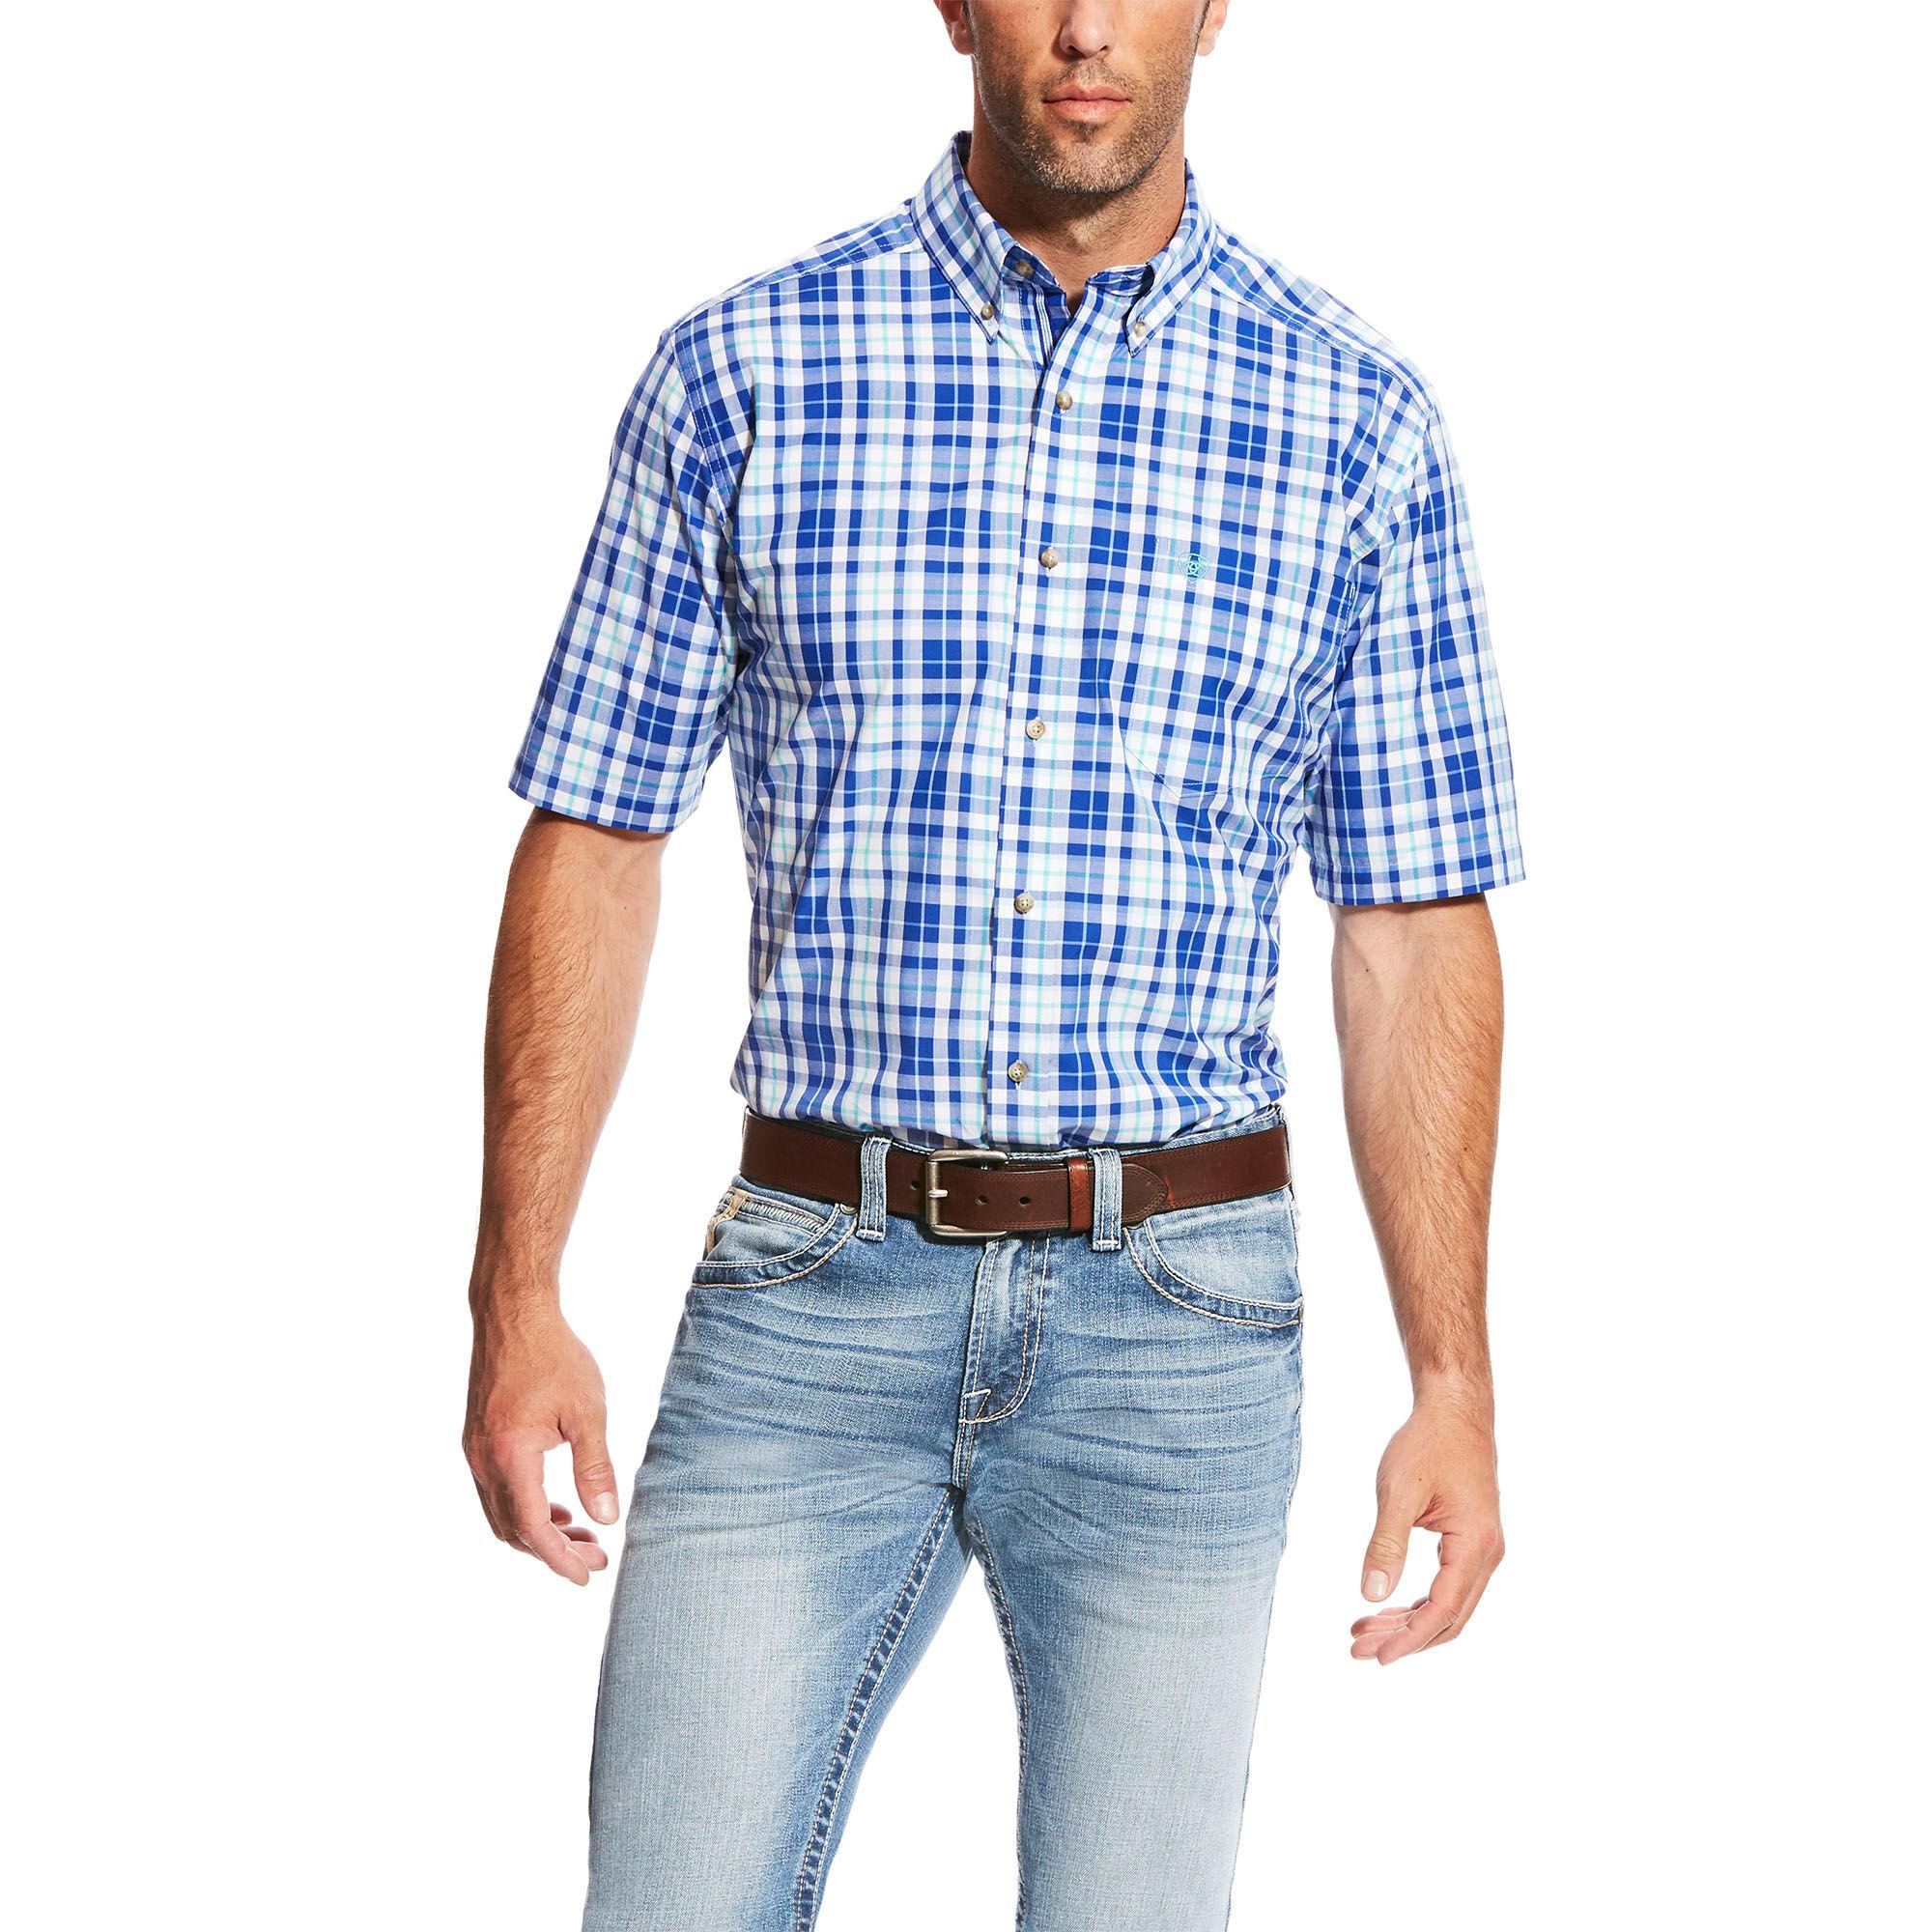 Pro Series Moudy Shirt